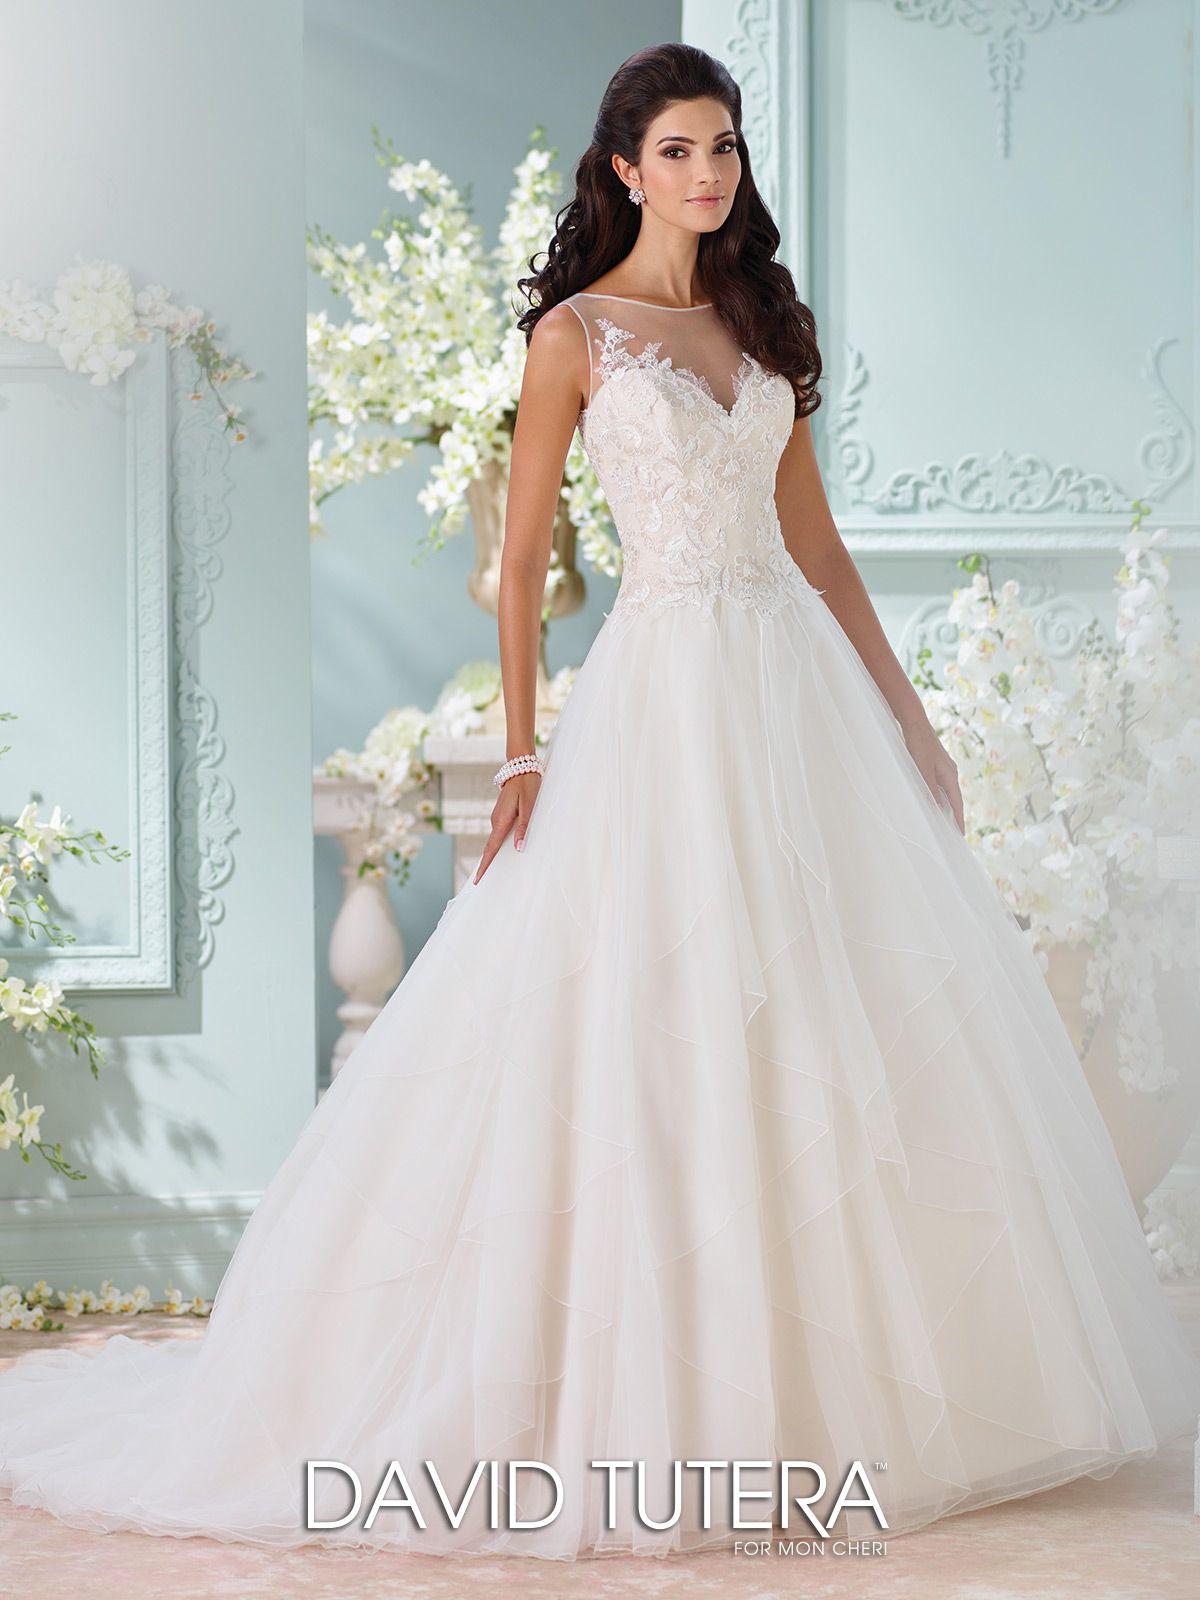 Unique Wedding Dresses Spring 2019 Martin Thornburg David Tutera Wedding Dresses Sleeveless Wedding Gown Davids Bridal Wedding Dresses